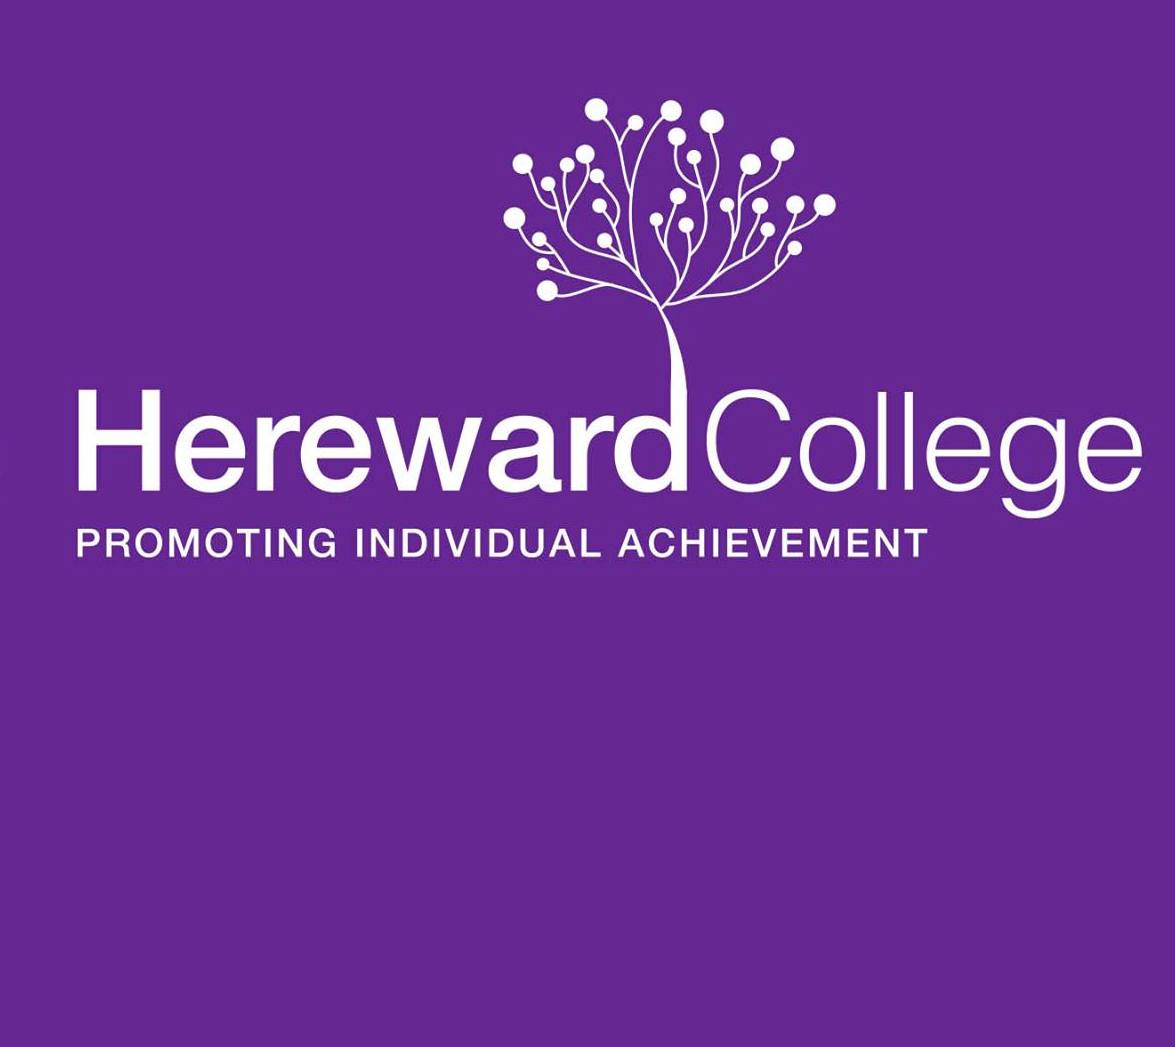 hereward-college 3.jpg